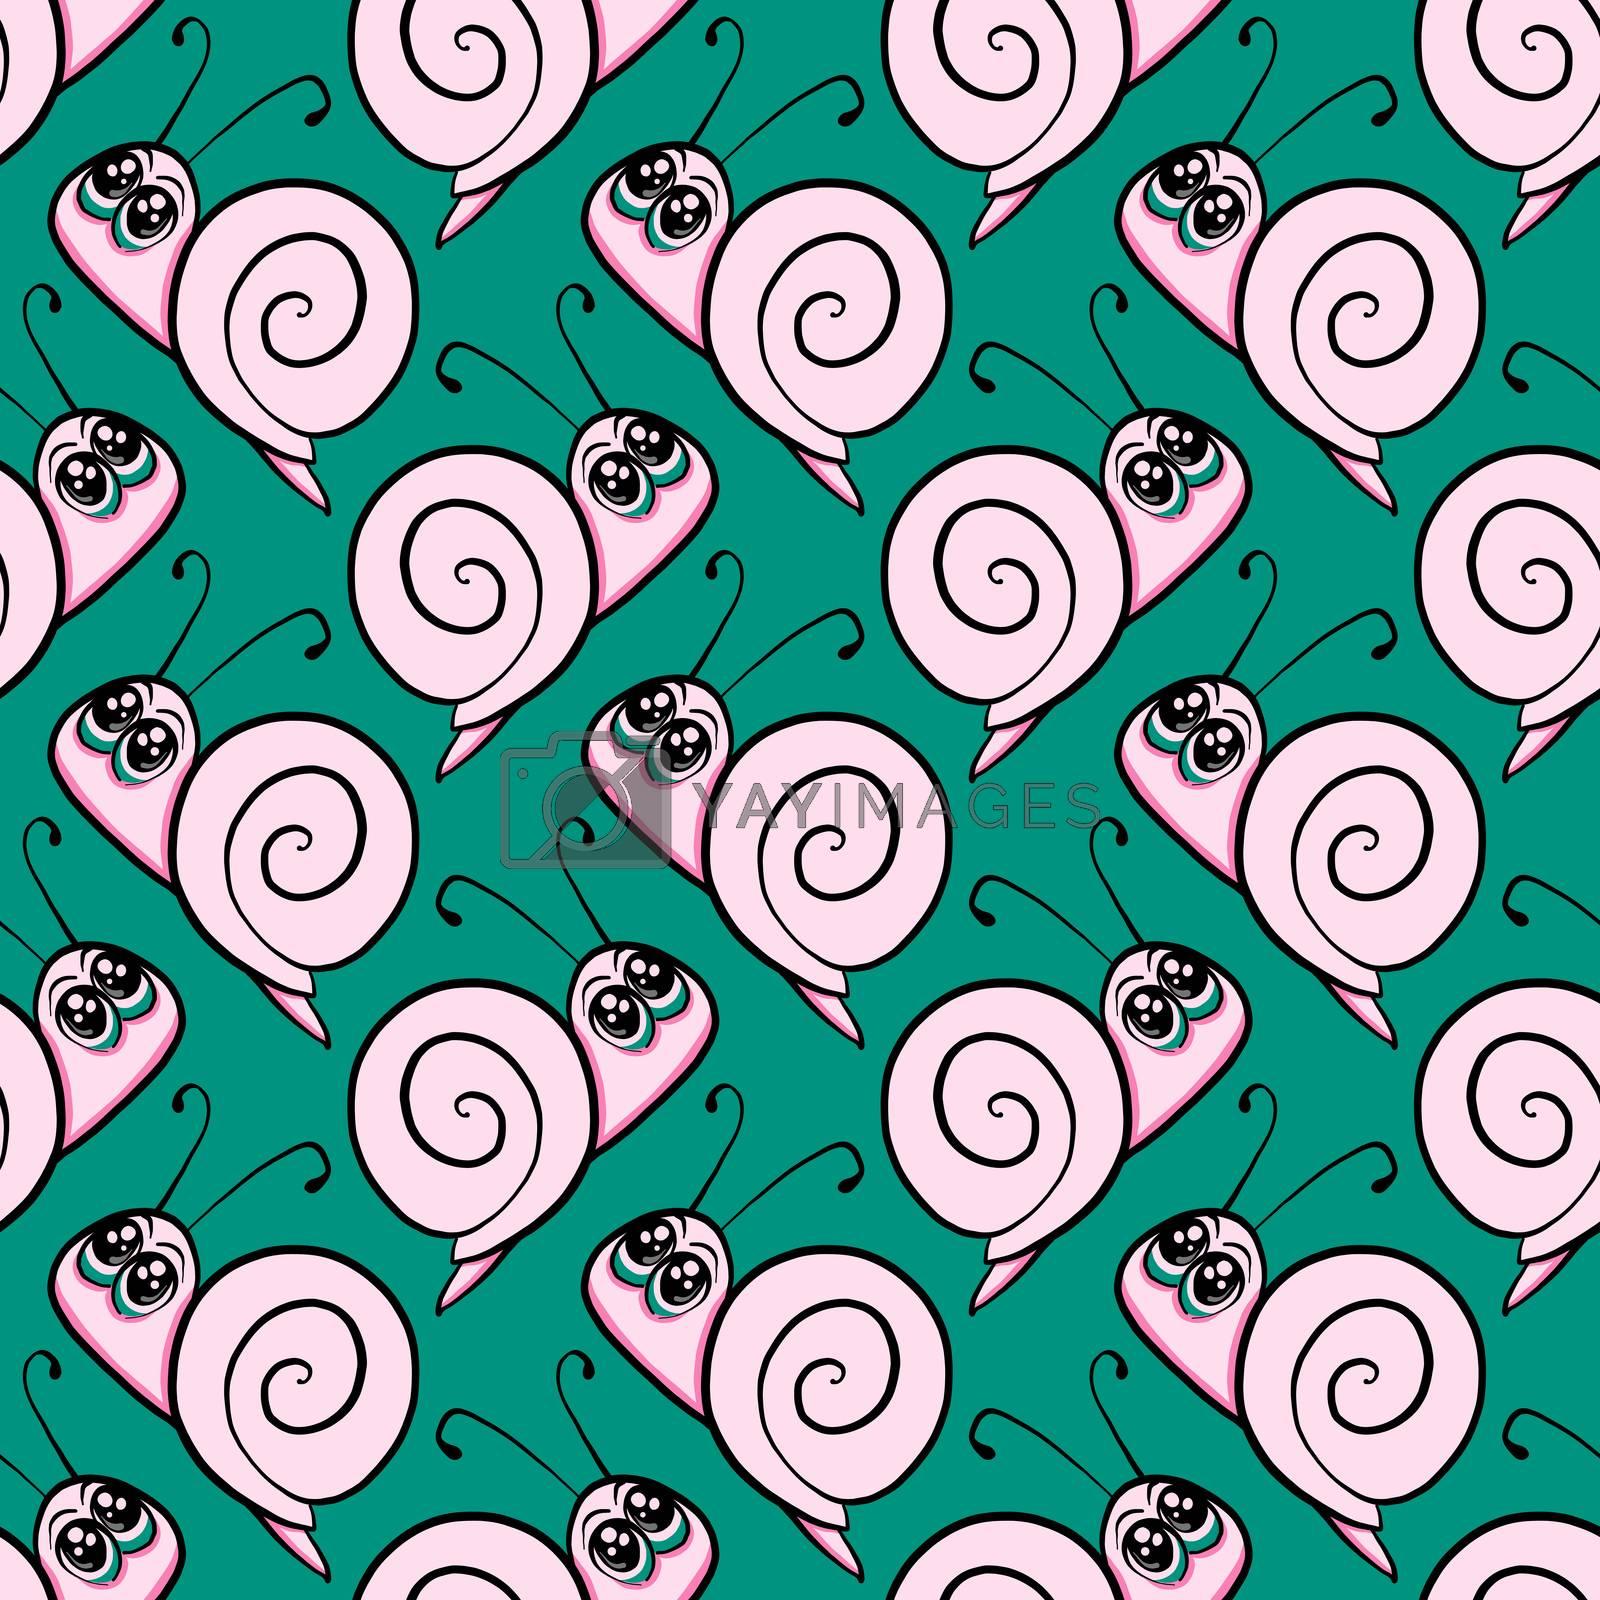 Snail pattern , illustration, vector on white background